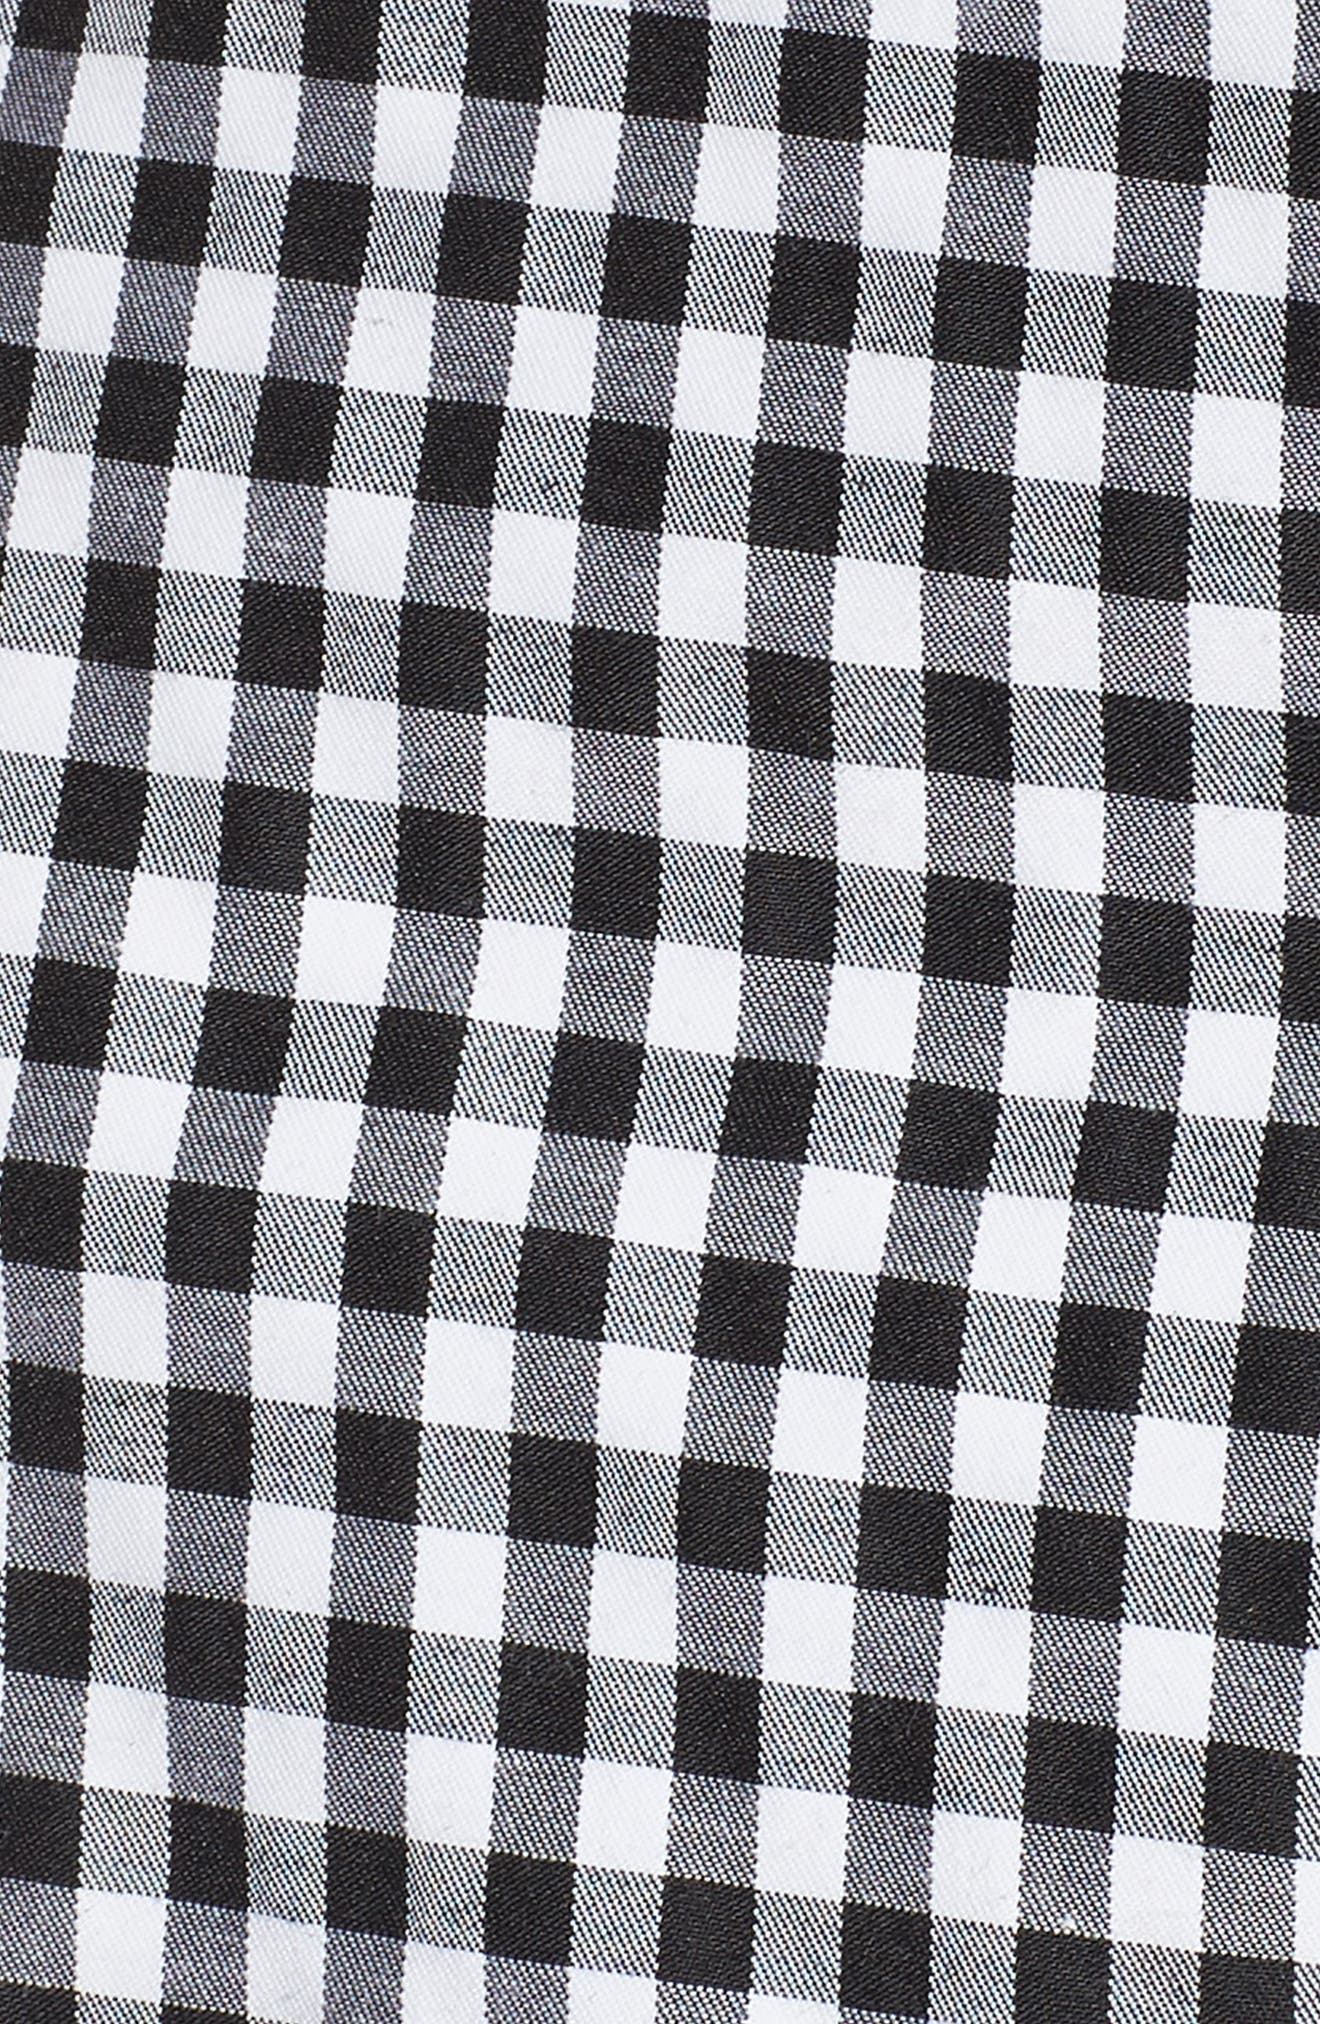 Buffalo Check Off the Shoulder Blouse,                             Alternate thumbnail 5, color,                             Black White Gingham